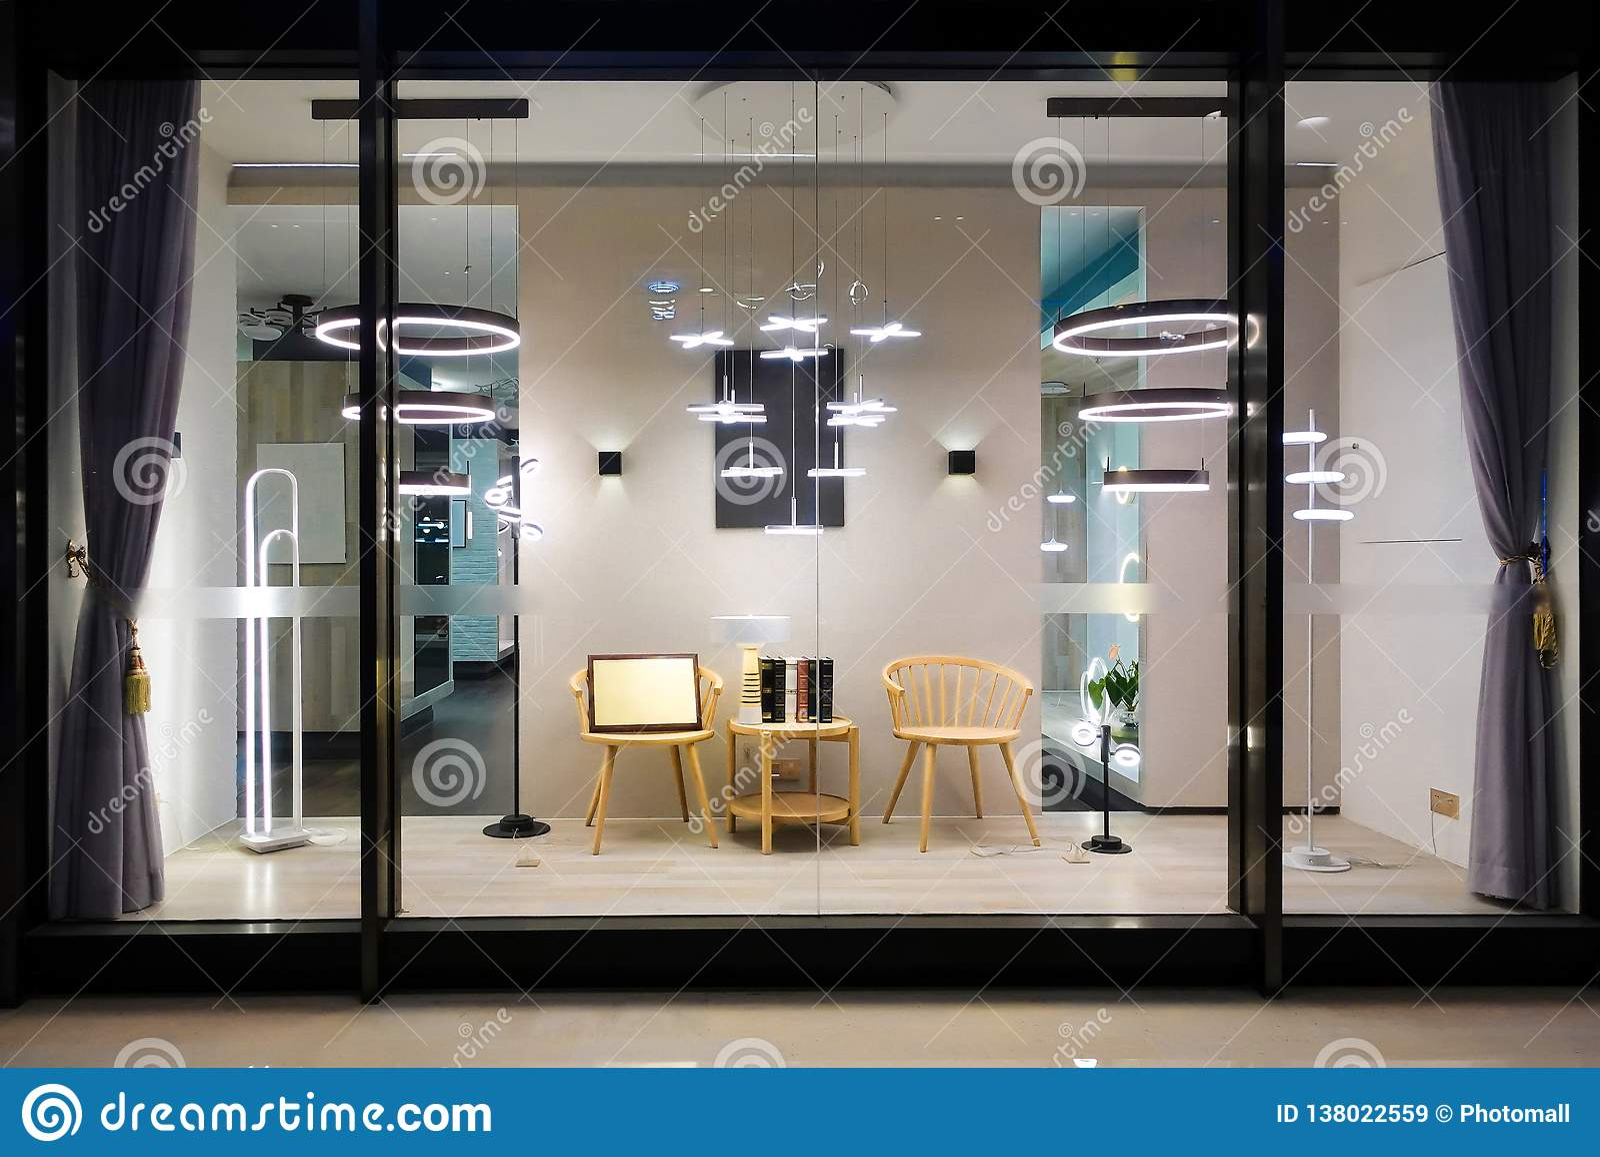 Furniture Lighting Display Window Shop Window Store Window Stock